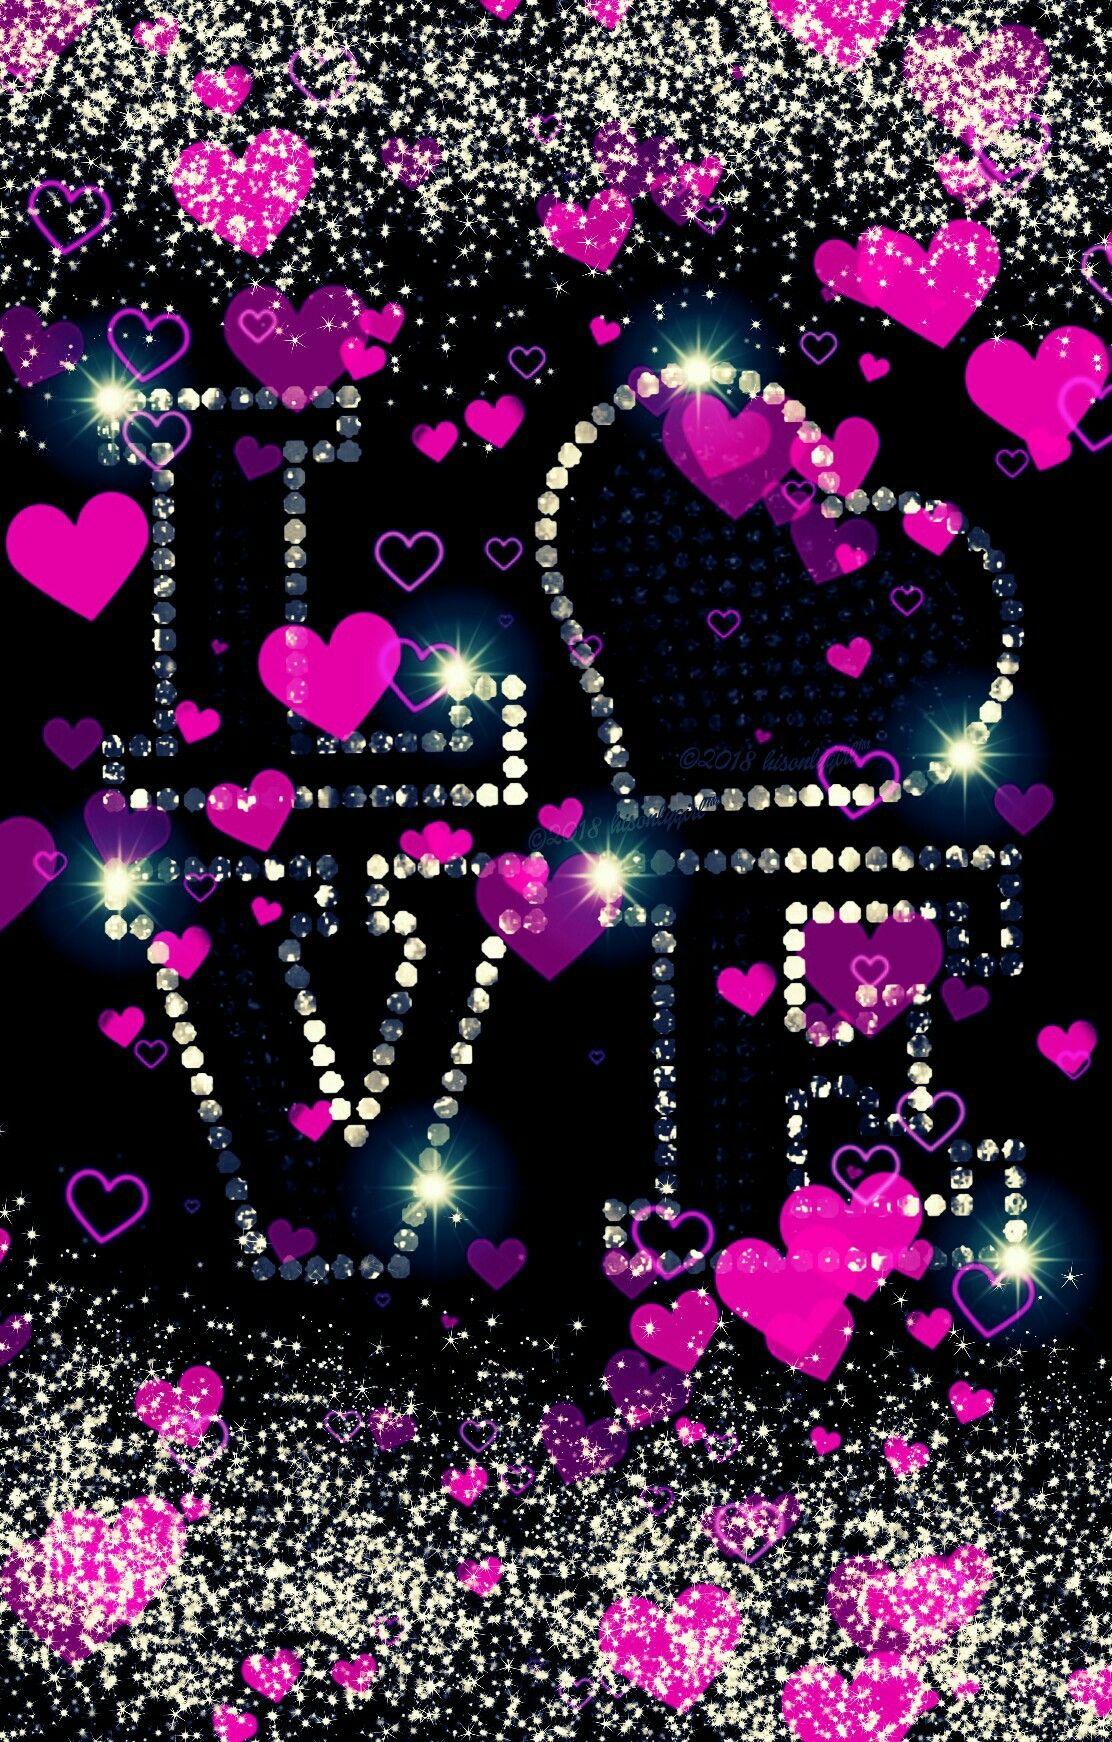 Pink hearts love glitter wallpaper I created for CocoPPa